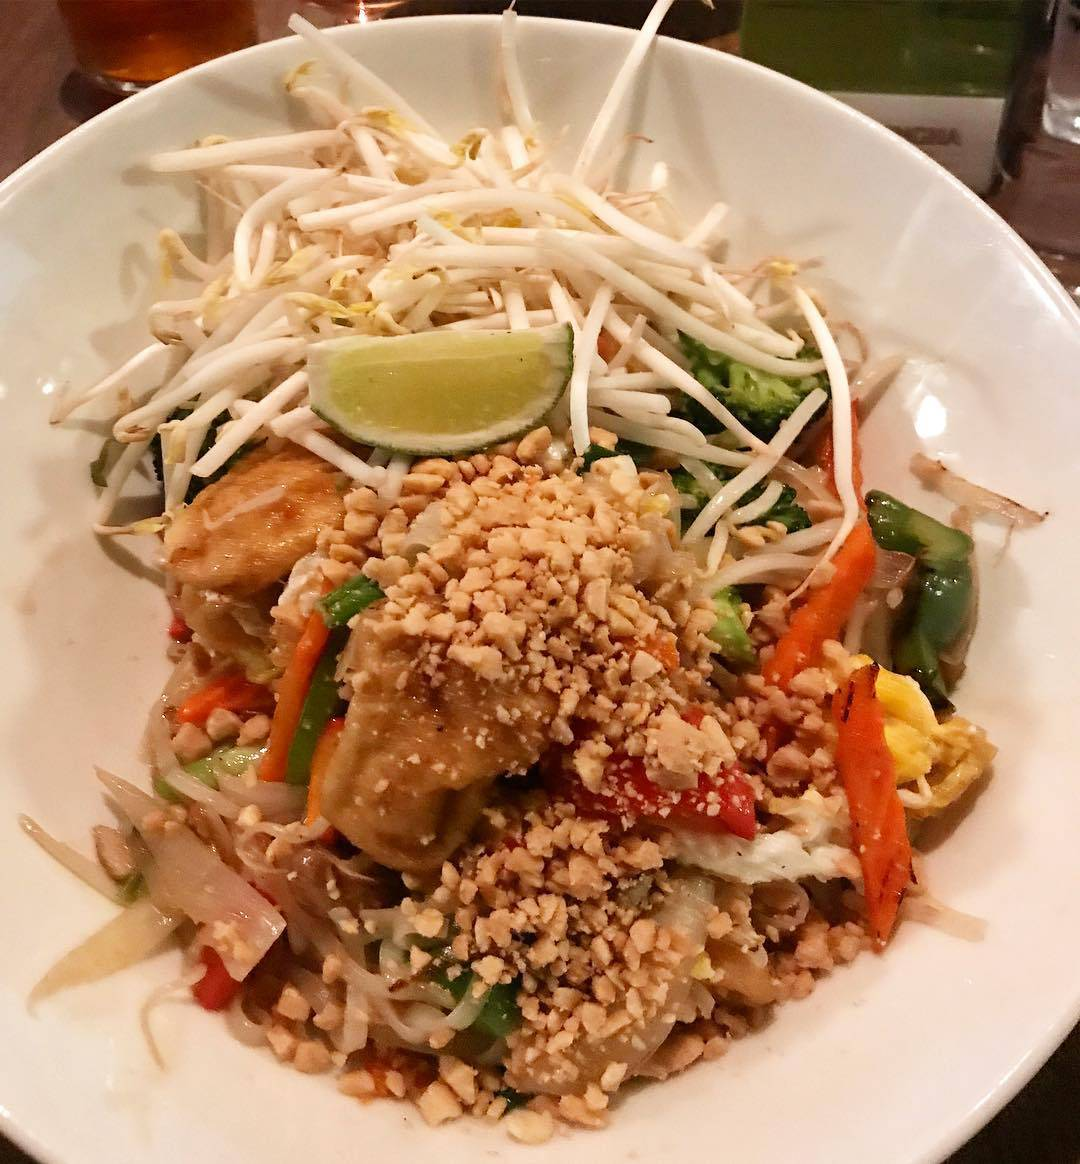 Bangkok Joe's's photo on #MeatlessMonday